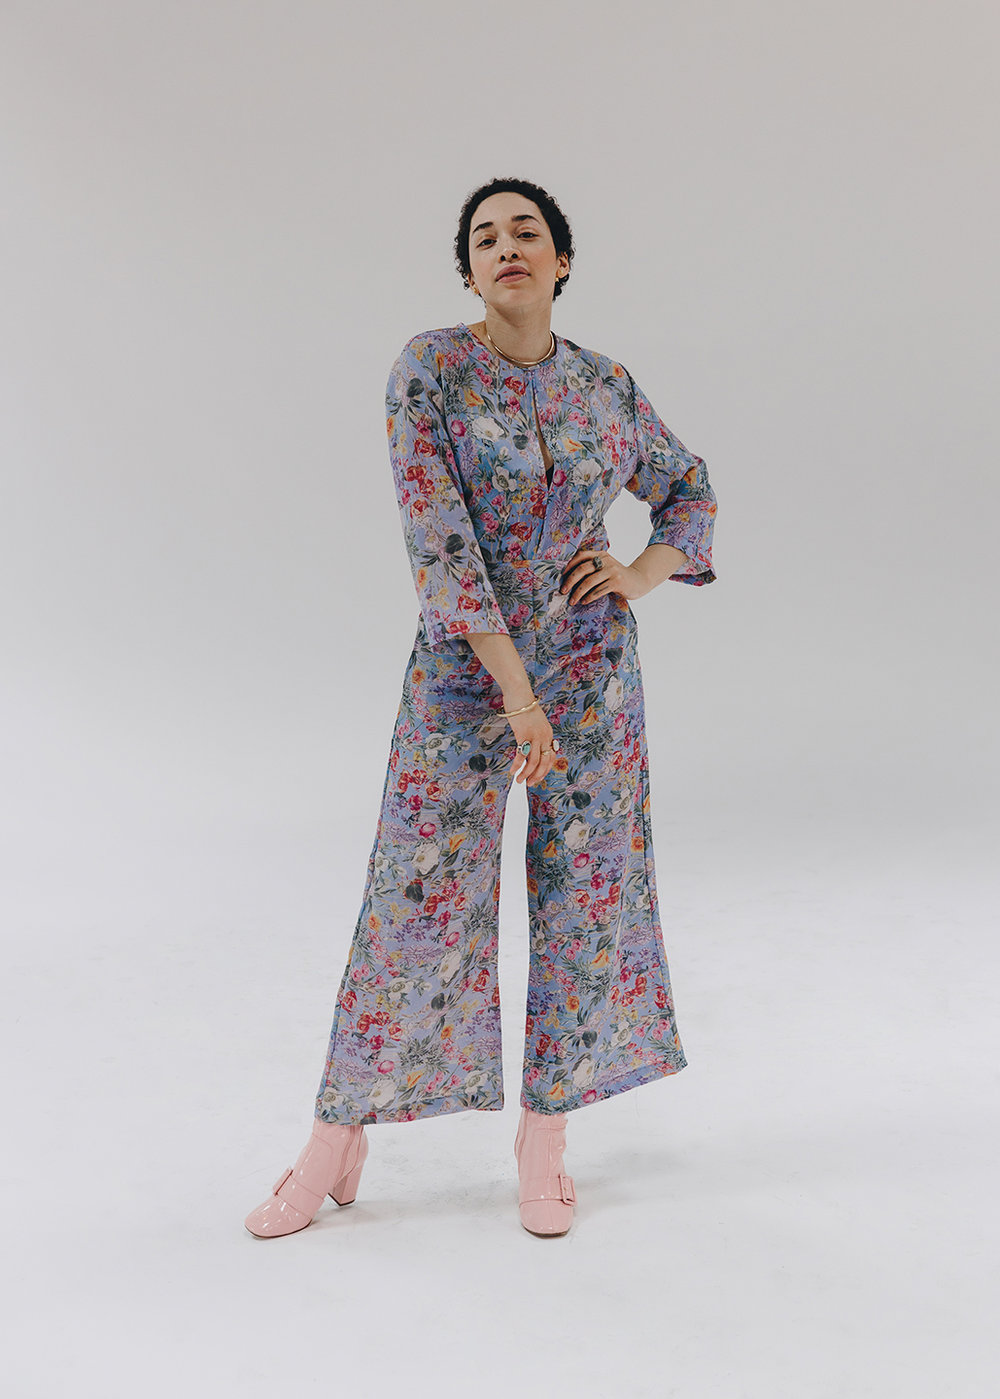 'Sonina' romper in Lilac Primrose,  $388